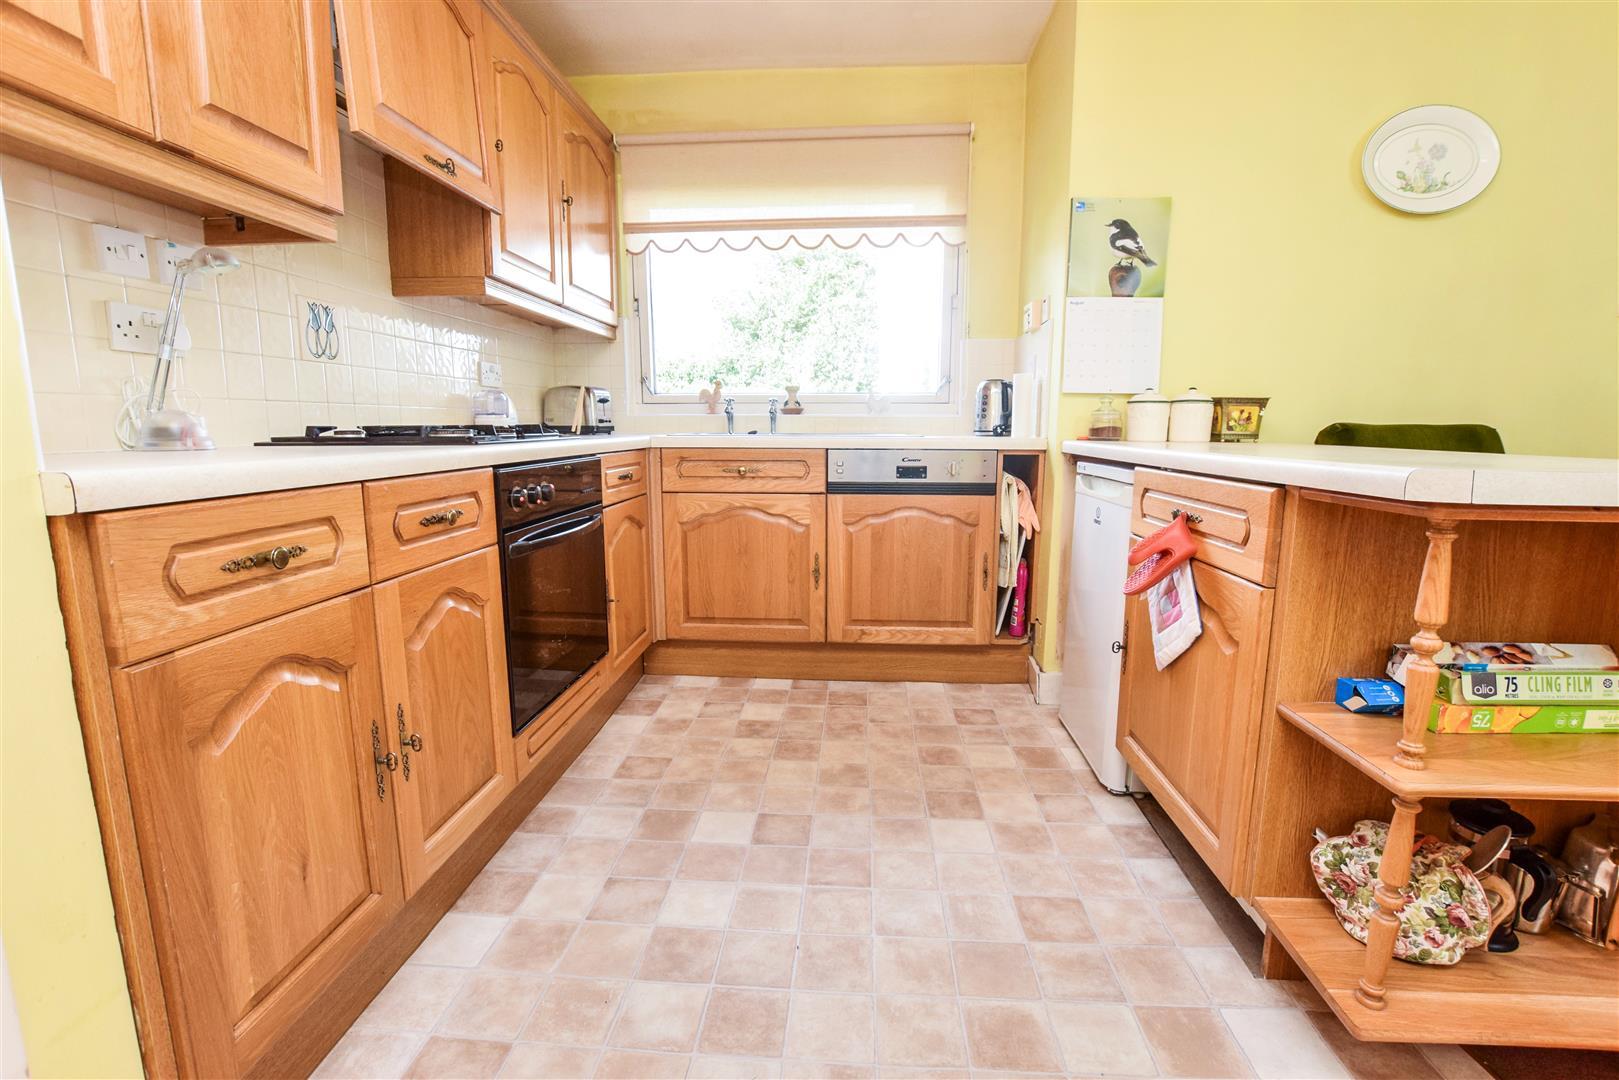 Glenmaller, 207, High Street, Auchterarder, Perthshire, PH3 1AF, UK